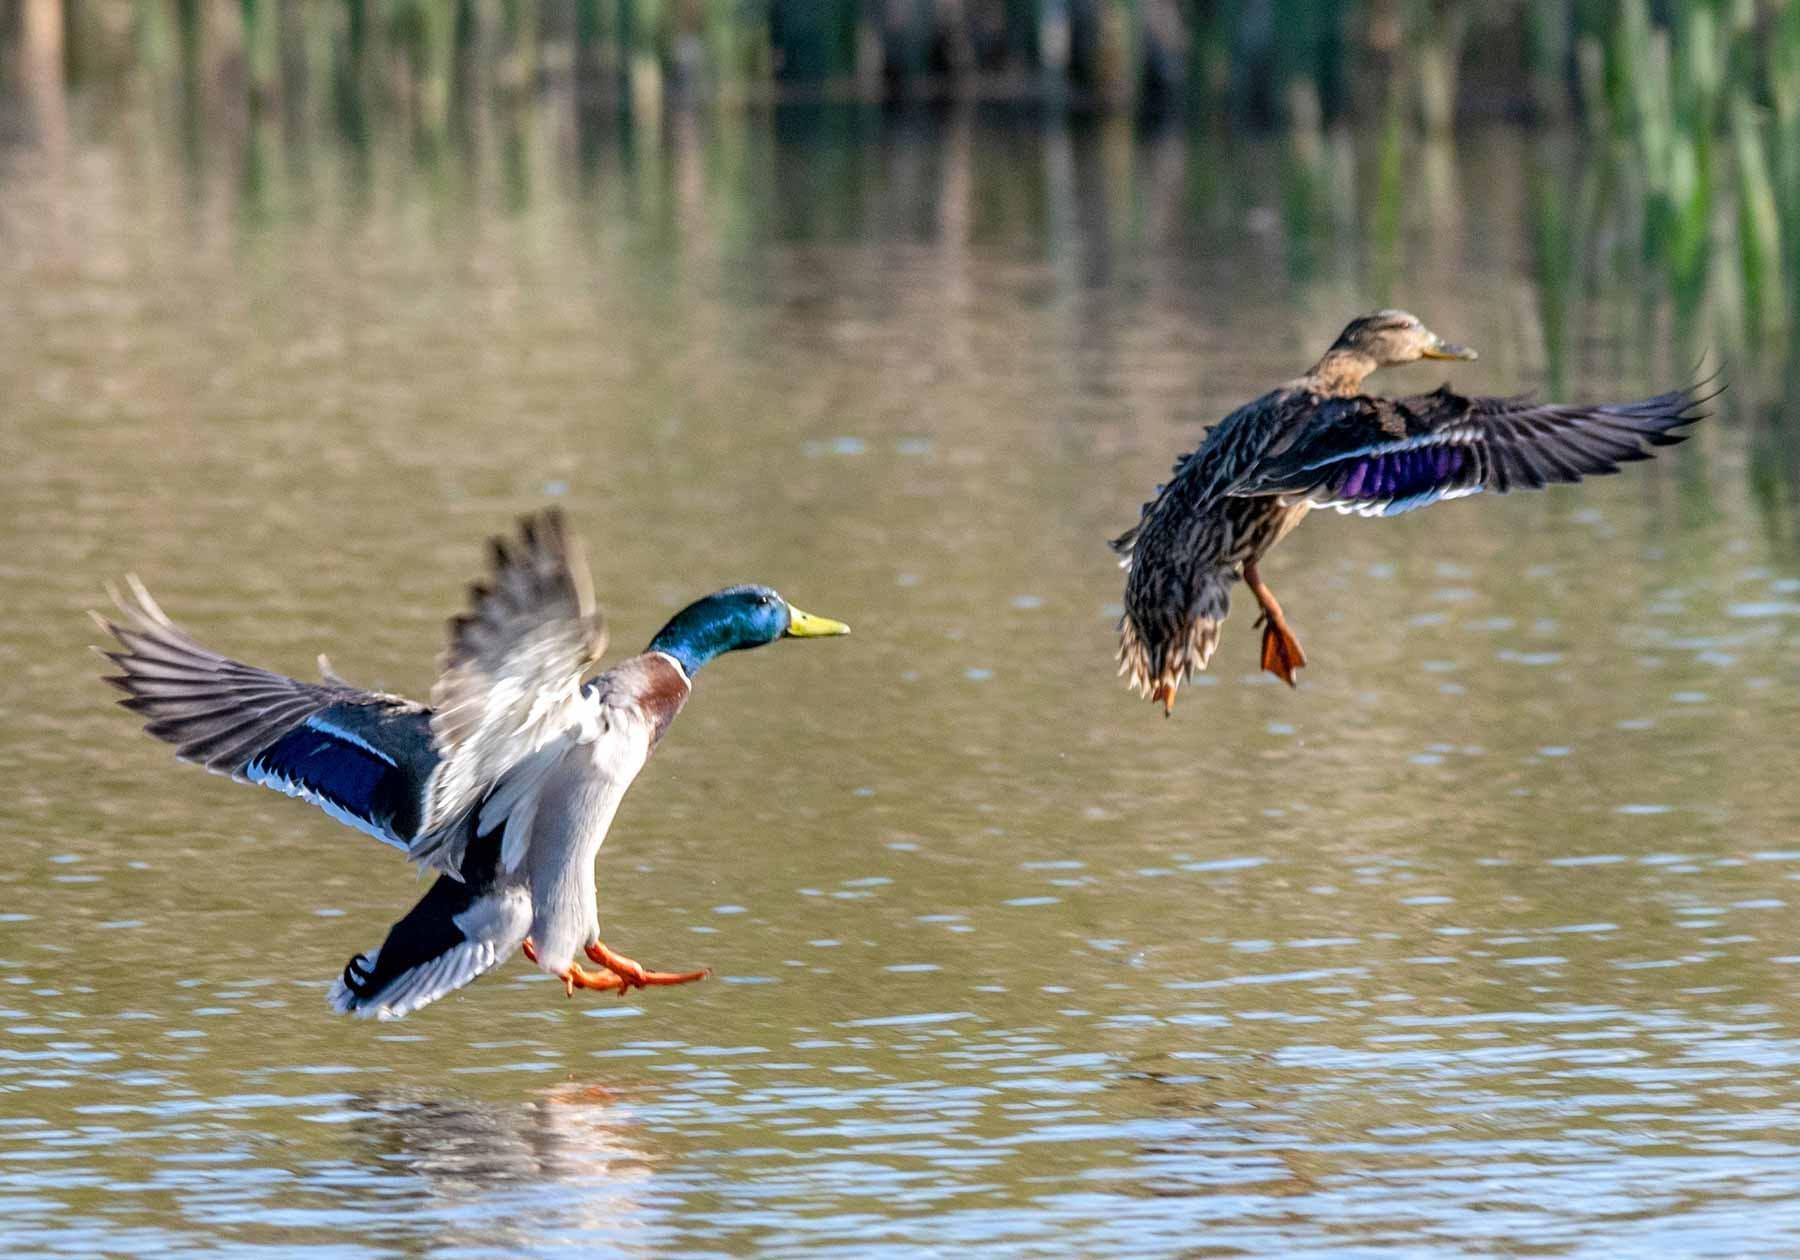 Mallard ducks in flight over water.